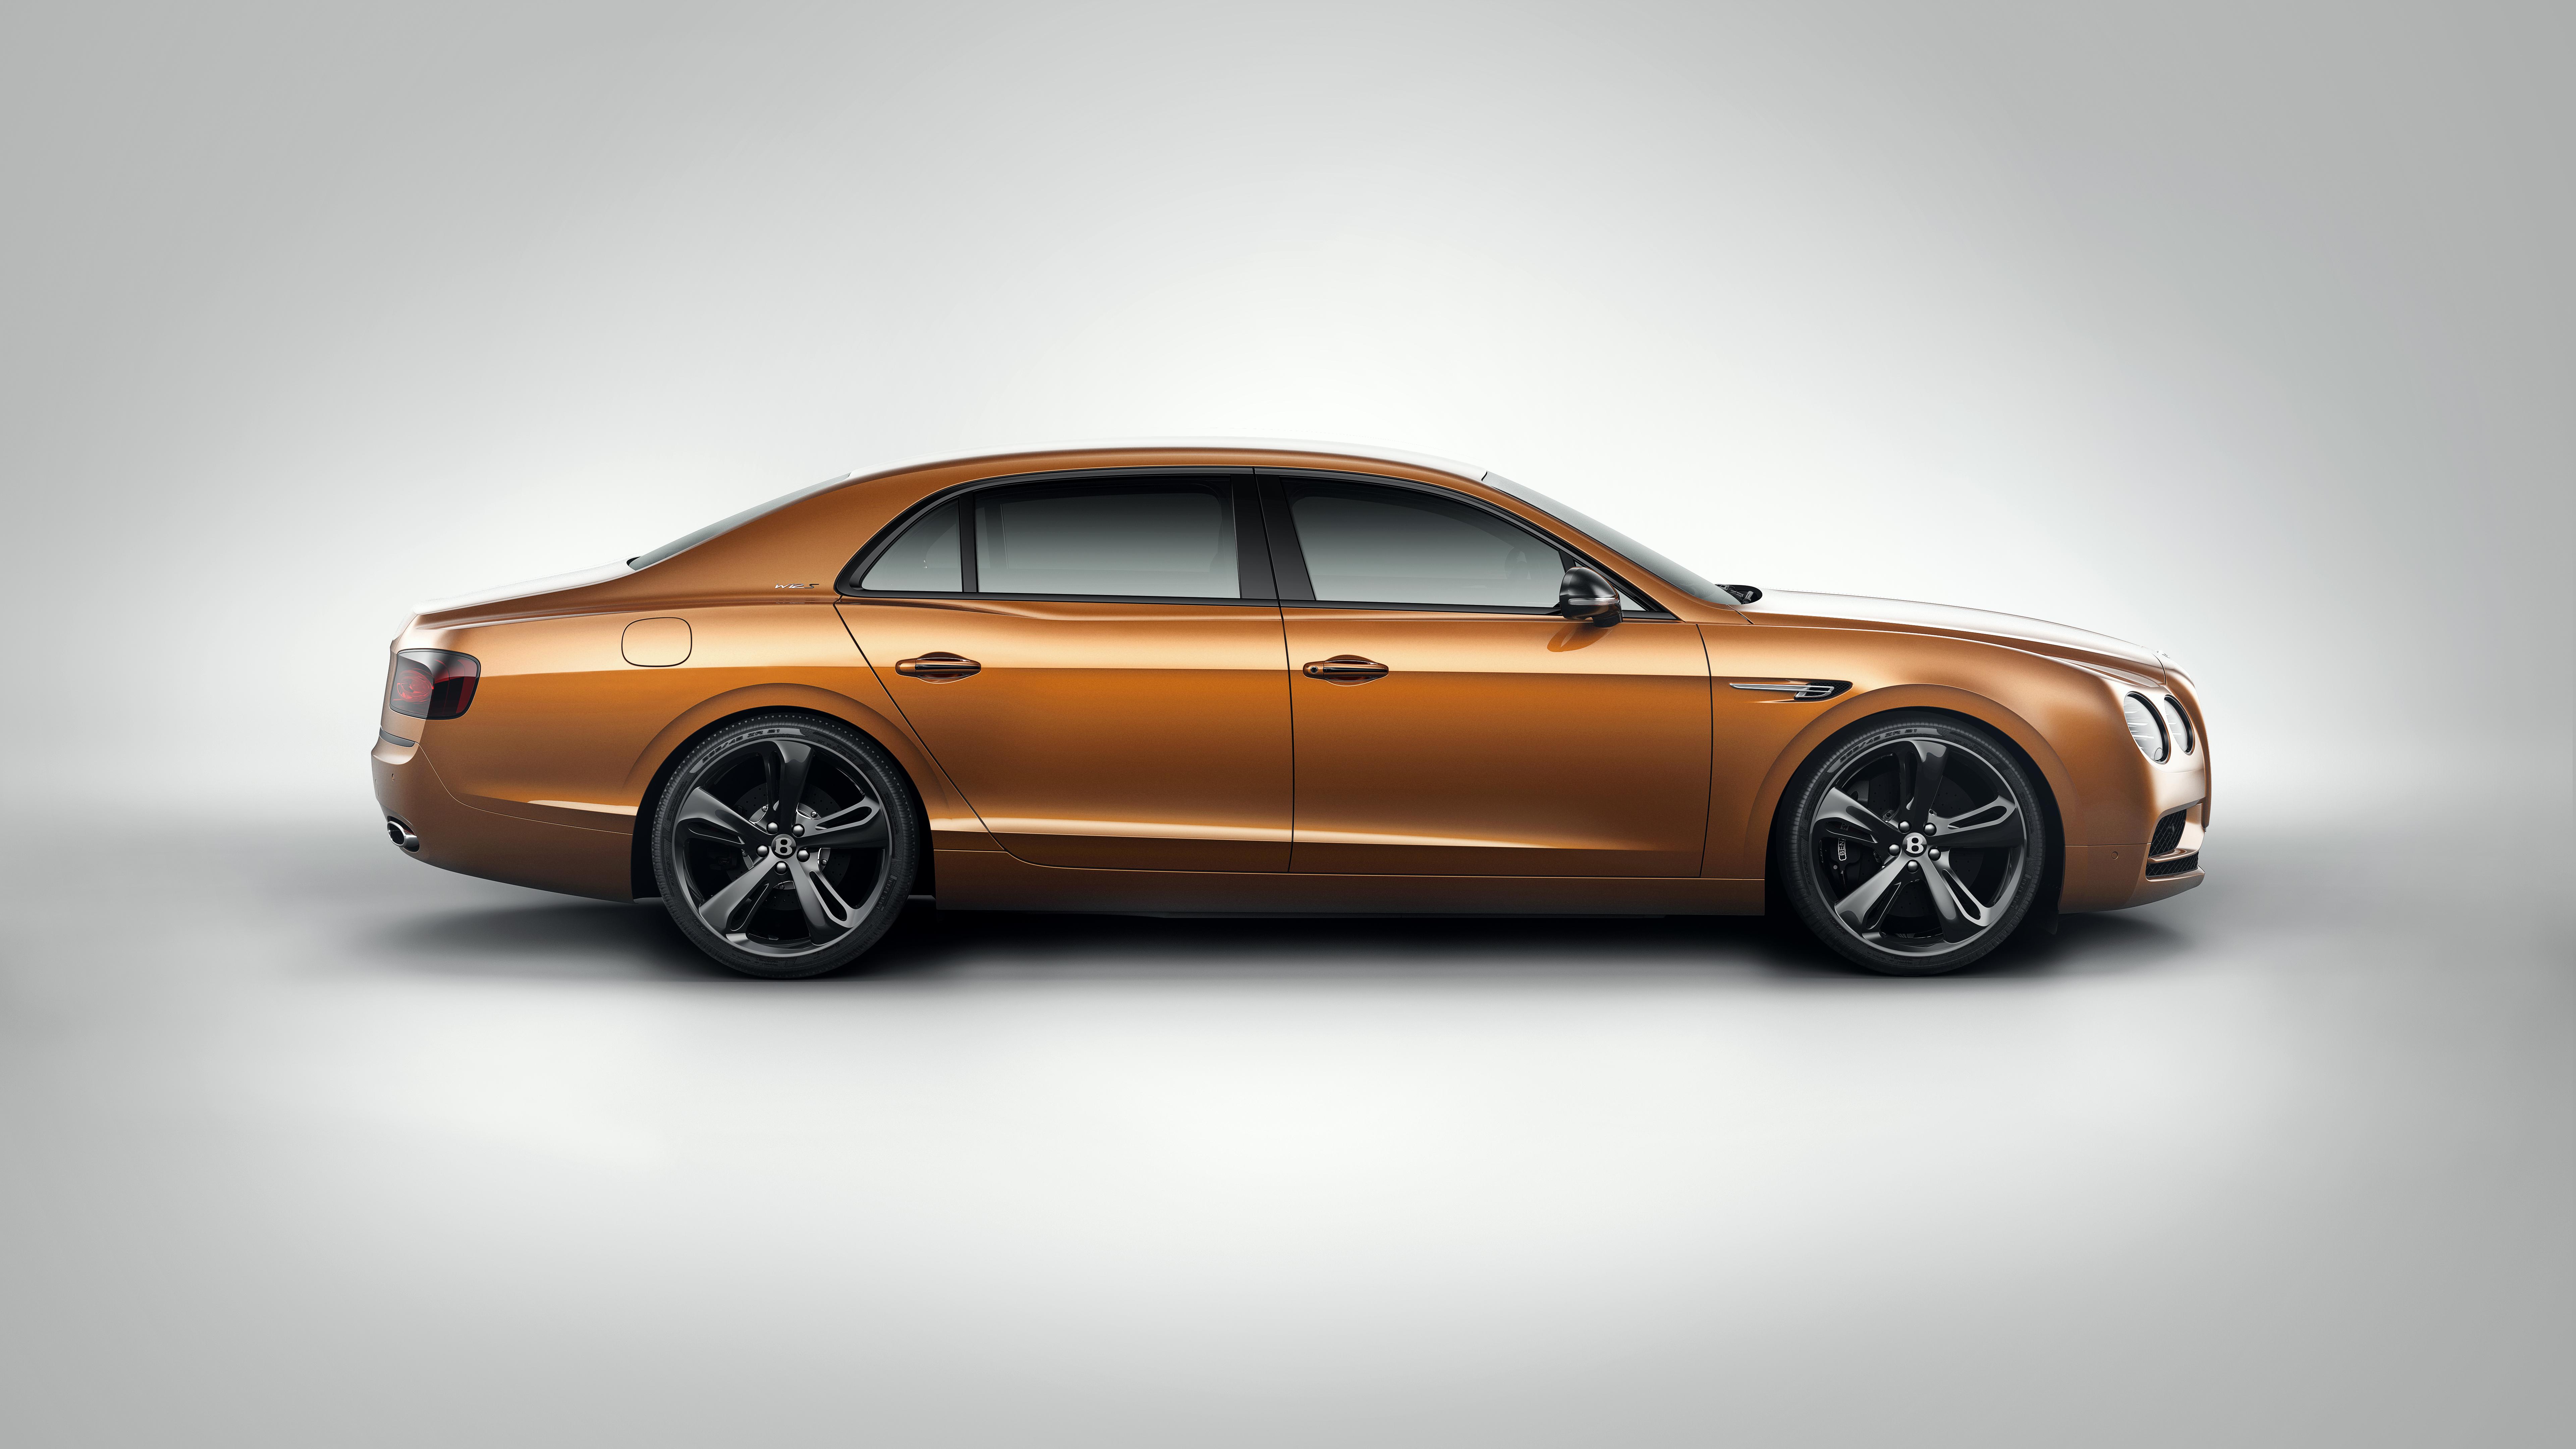 Project Audi S7